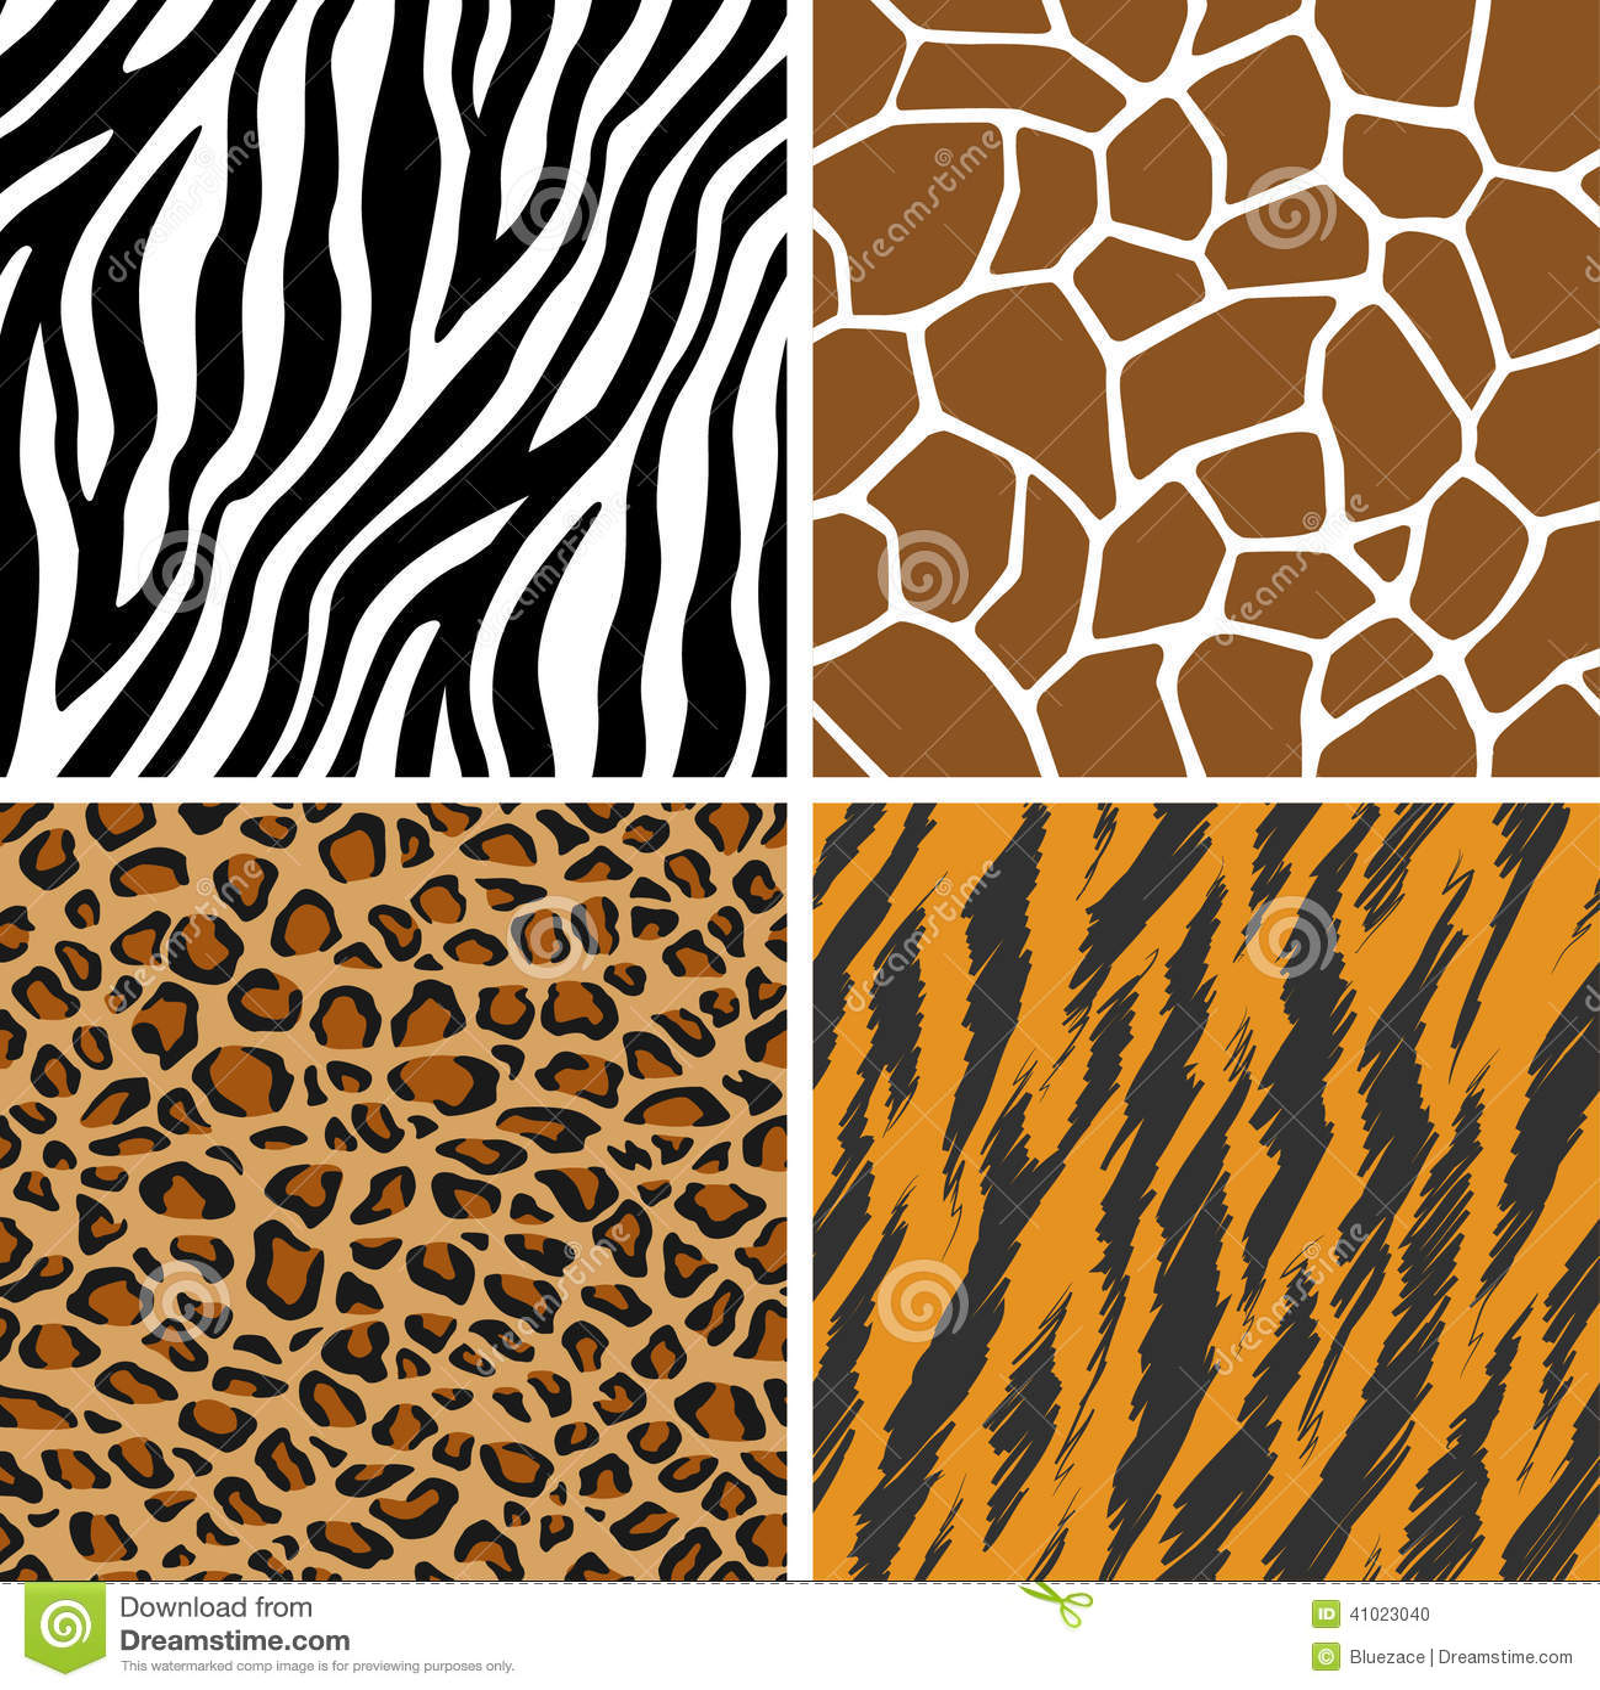 animal skin patterns giraffe - photo #18